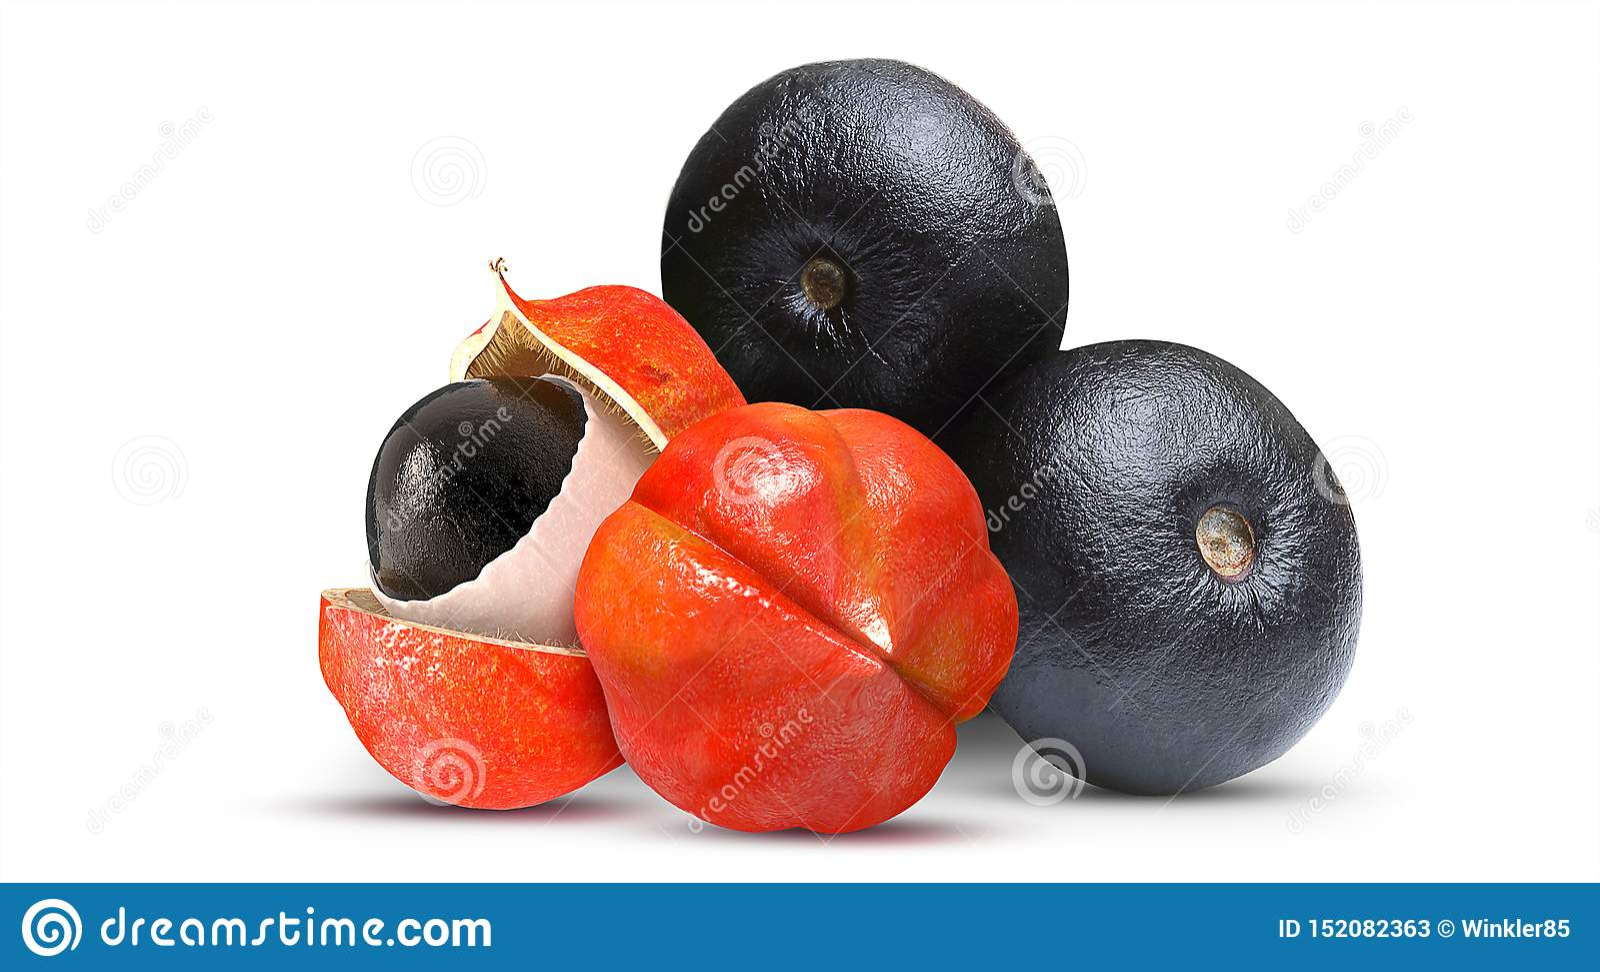 Acai en Guarana-Fruit Braziliaans fruit